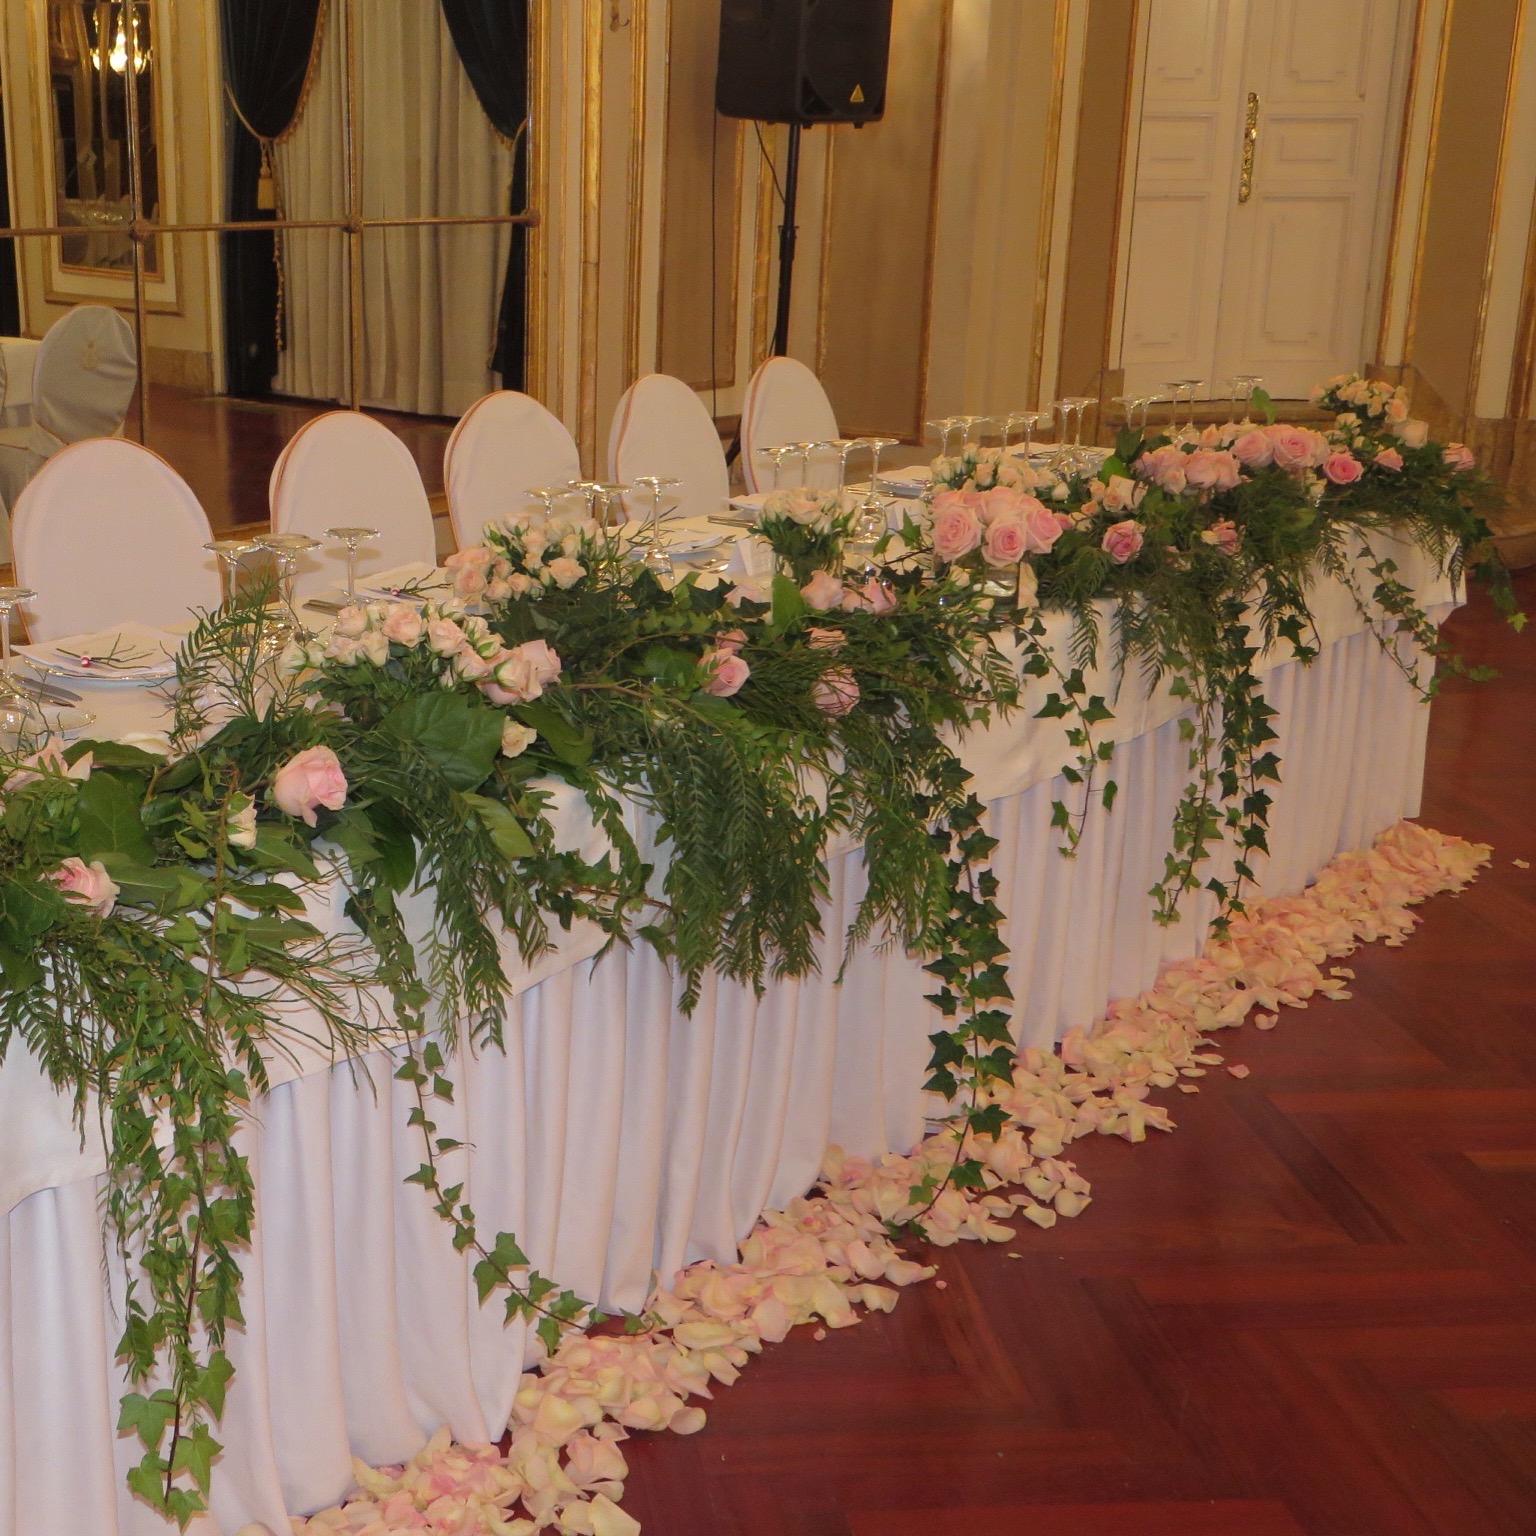 Decoración para boda en Hotel Palace Salón Imperial